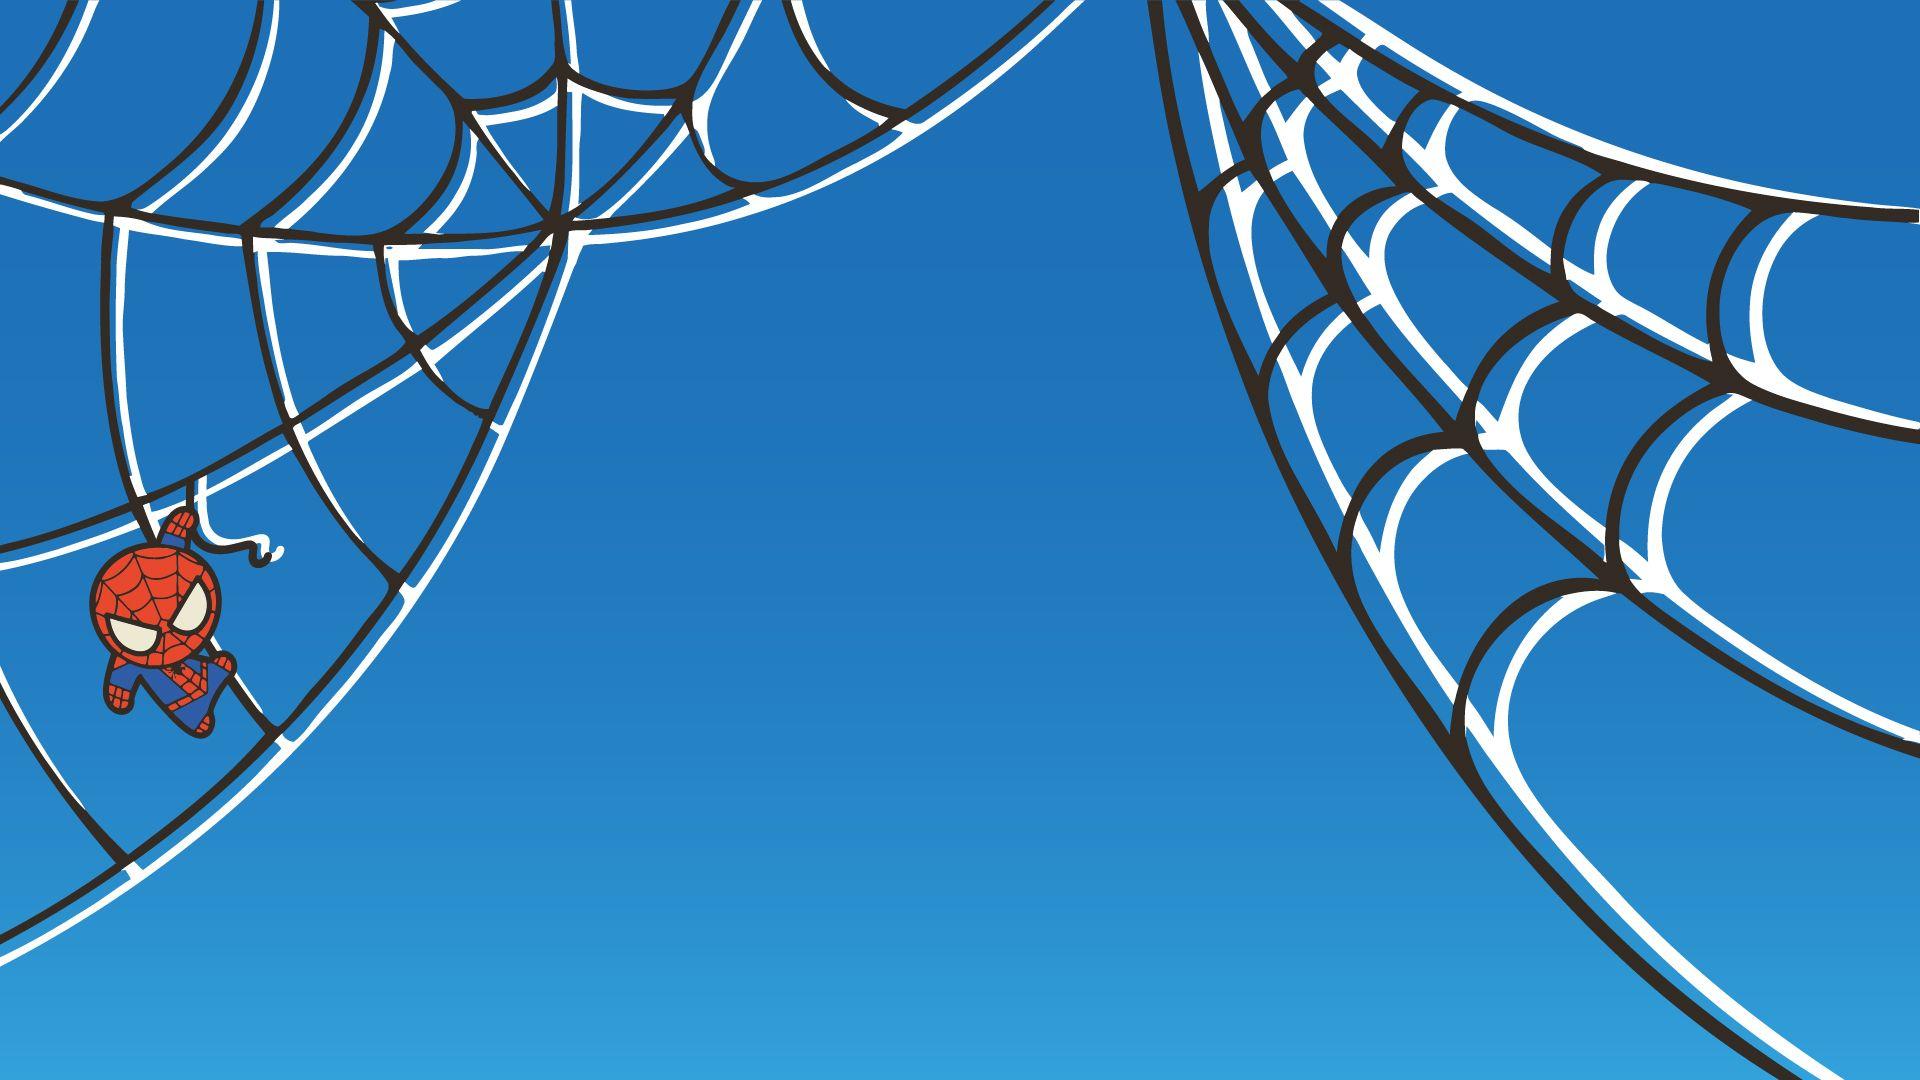 [1920x1080] [PS4] Cute Spiderman Wallpaper Need iPhone